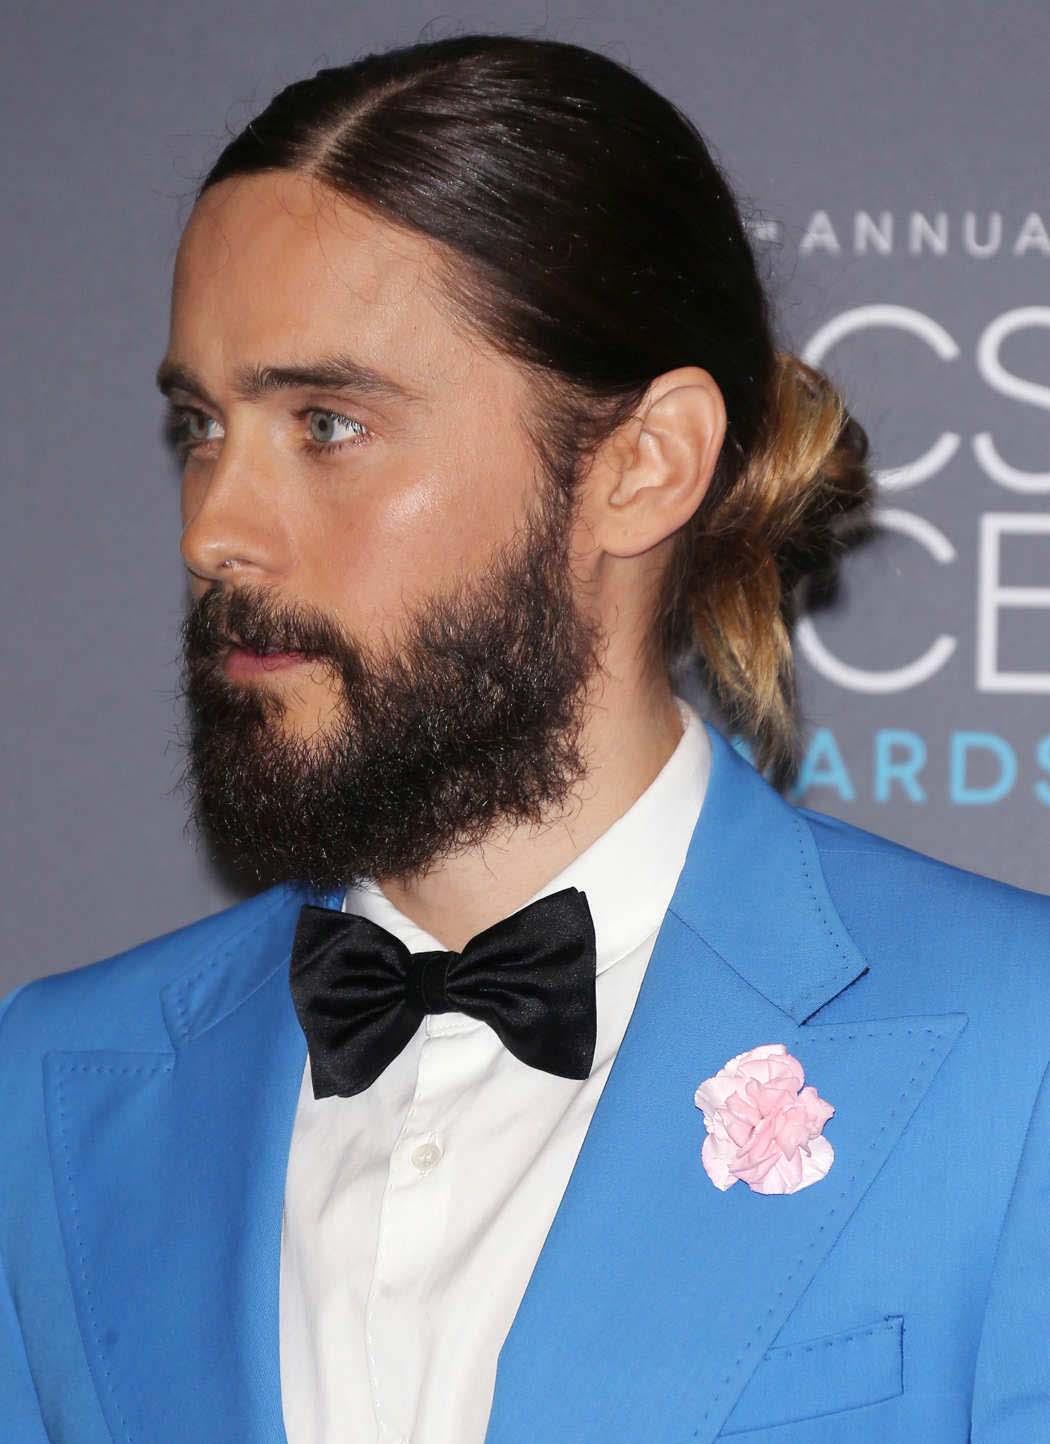 Boxed Beard Styles 2018